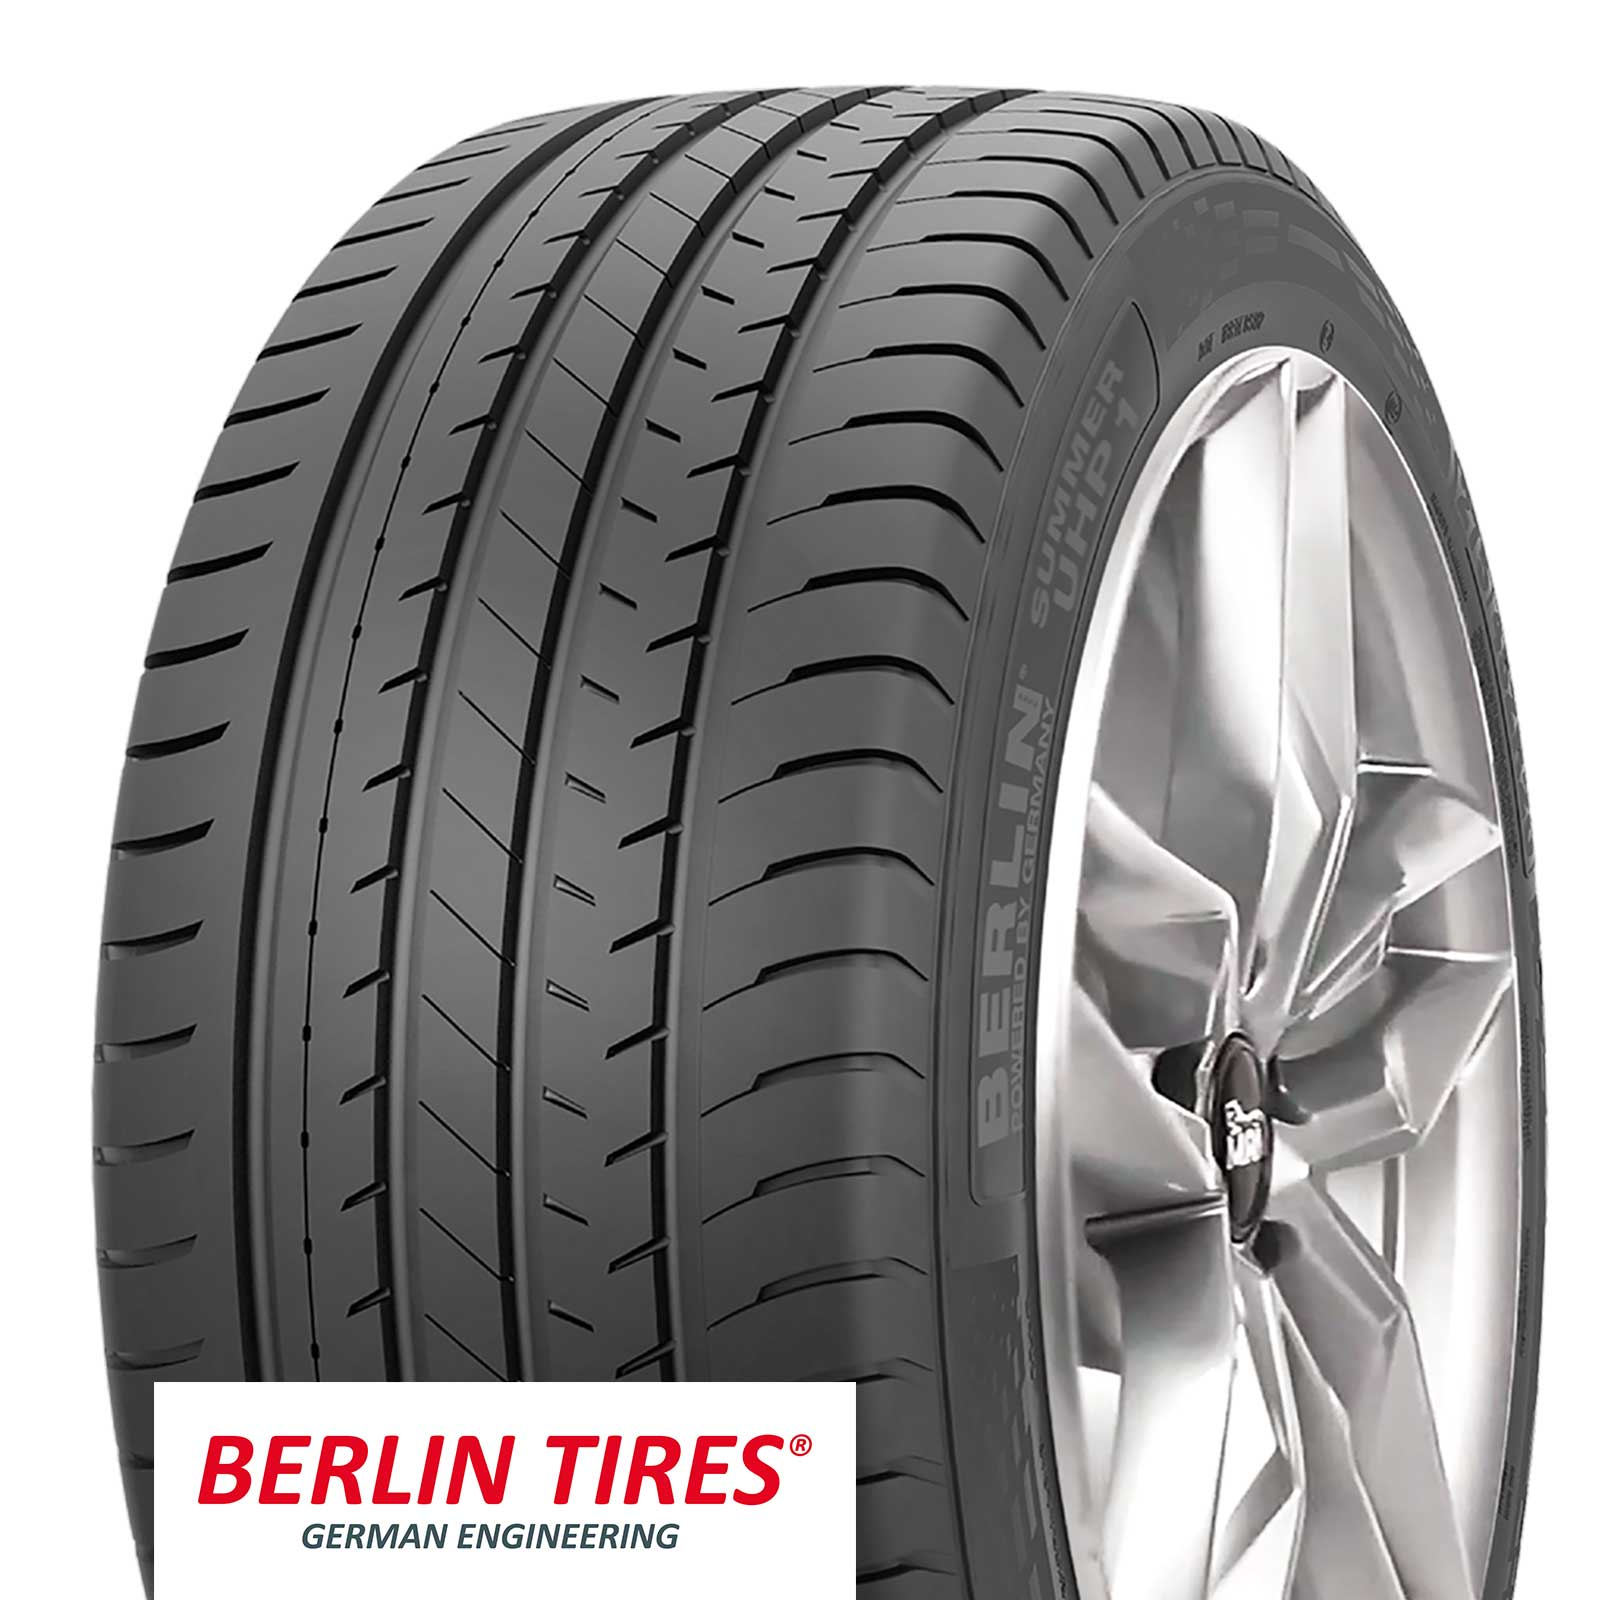 berlin tires sommerreifen 245 40 r18 97y premium qualit t. Black Bedroom Furniture Sets. Home Design Ideas